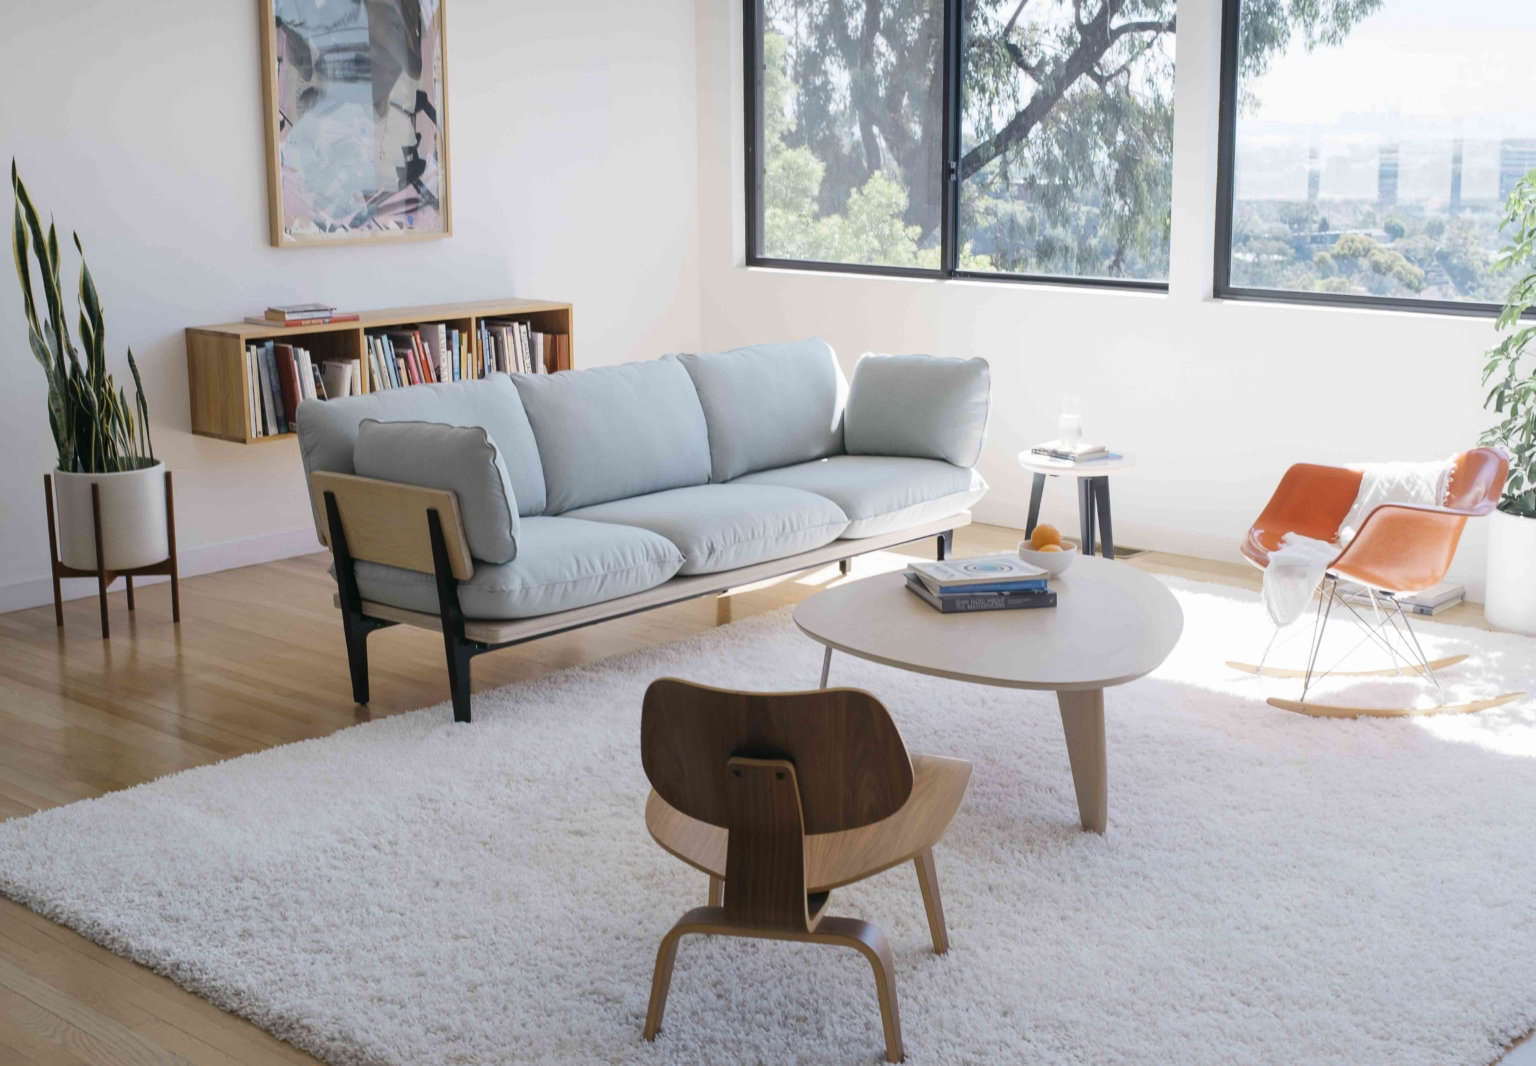 floyd sofa in situ